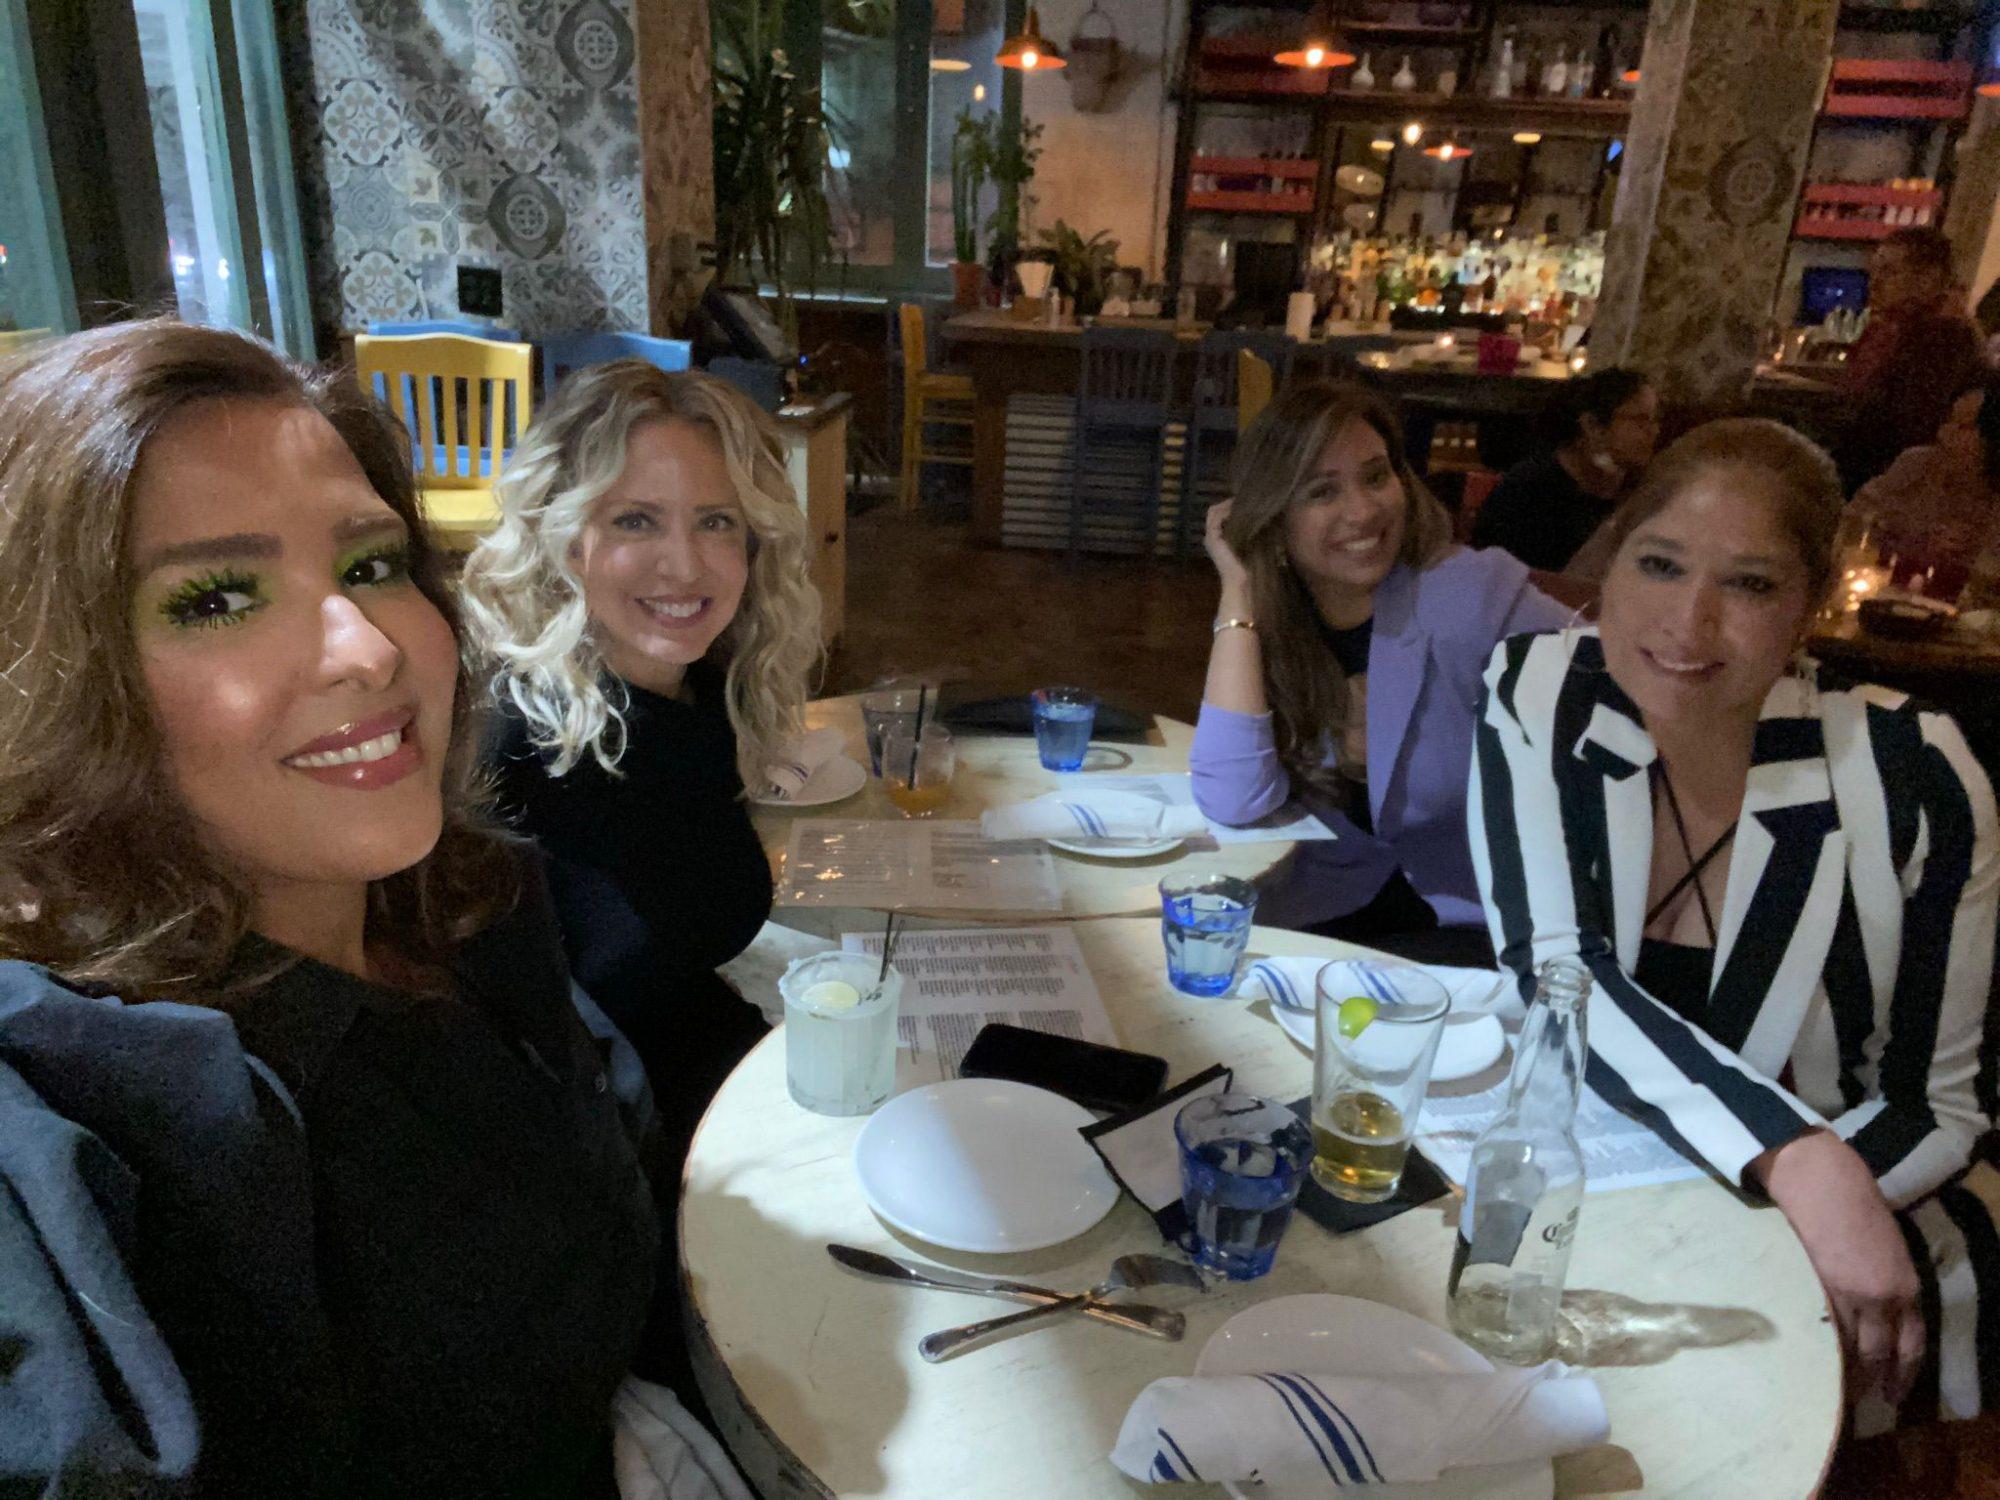 Momento L'Oréal Yolaine cena con amigas